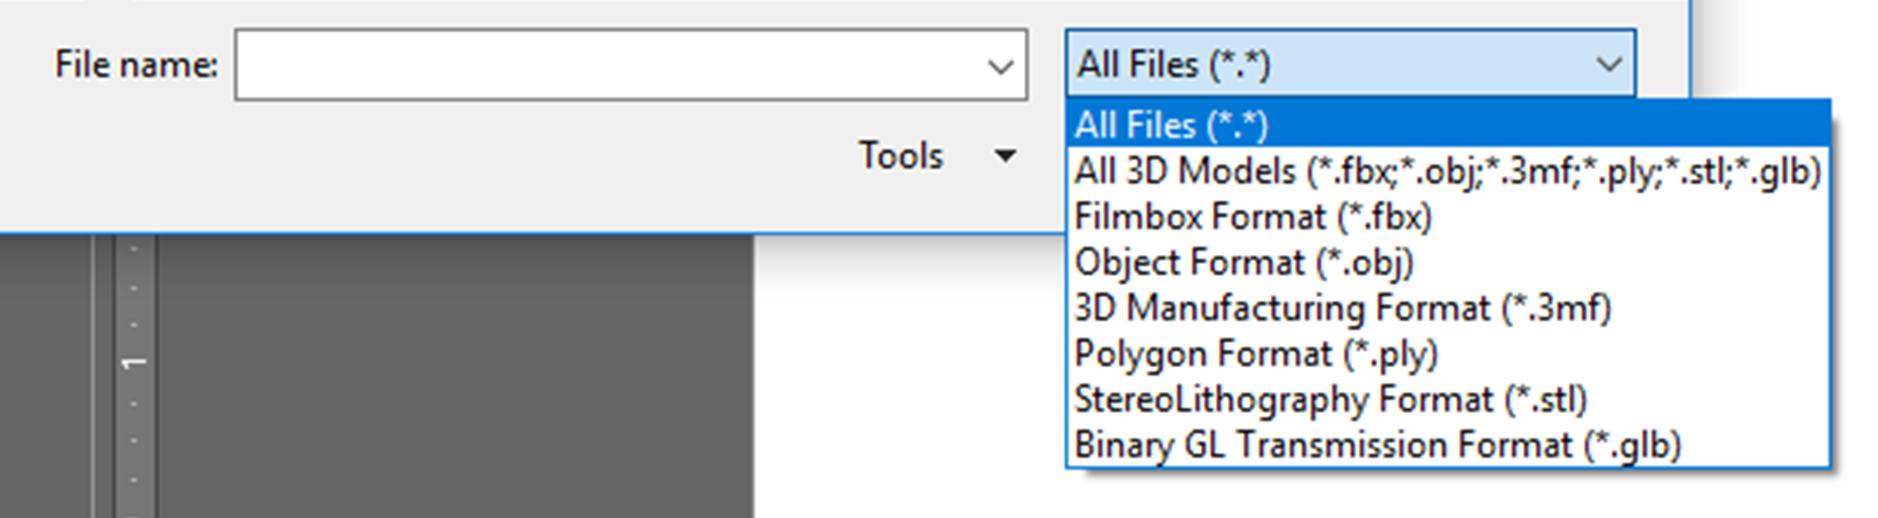 Type of 3D model file format